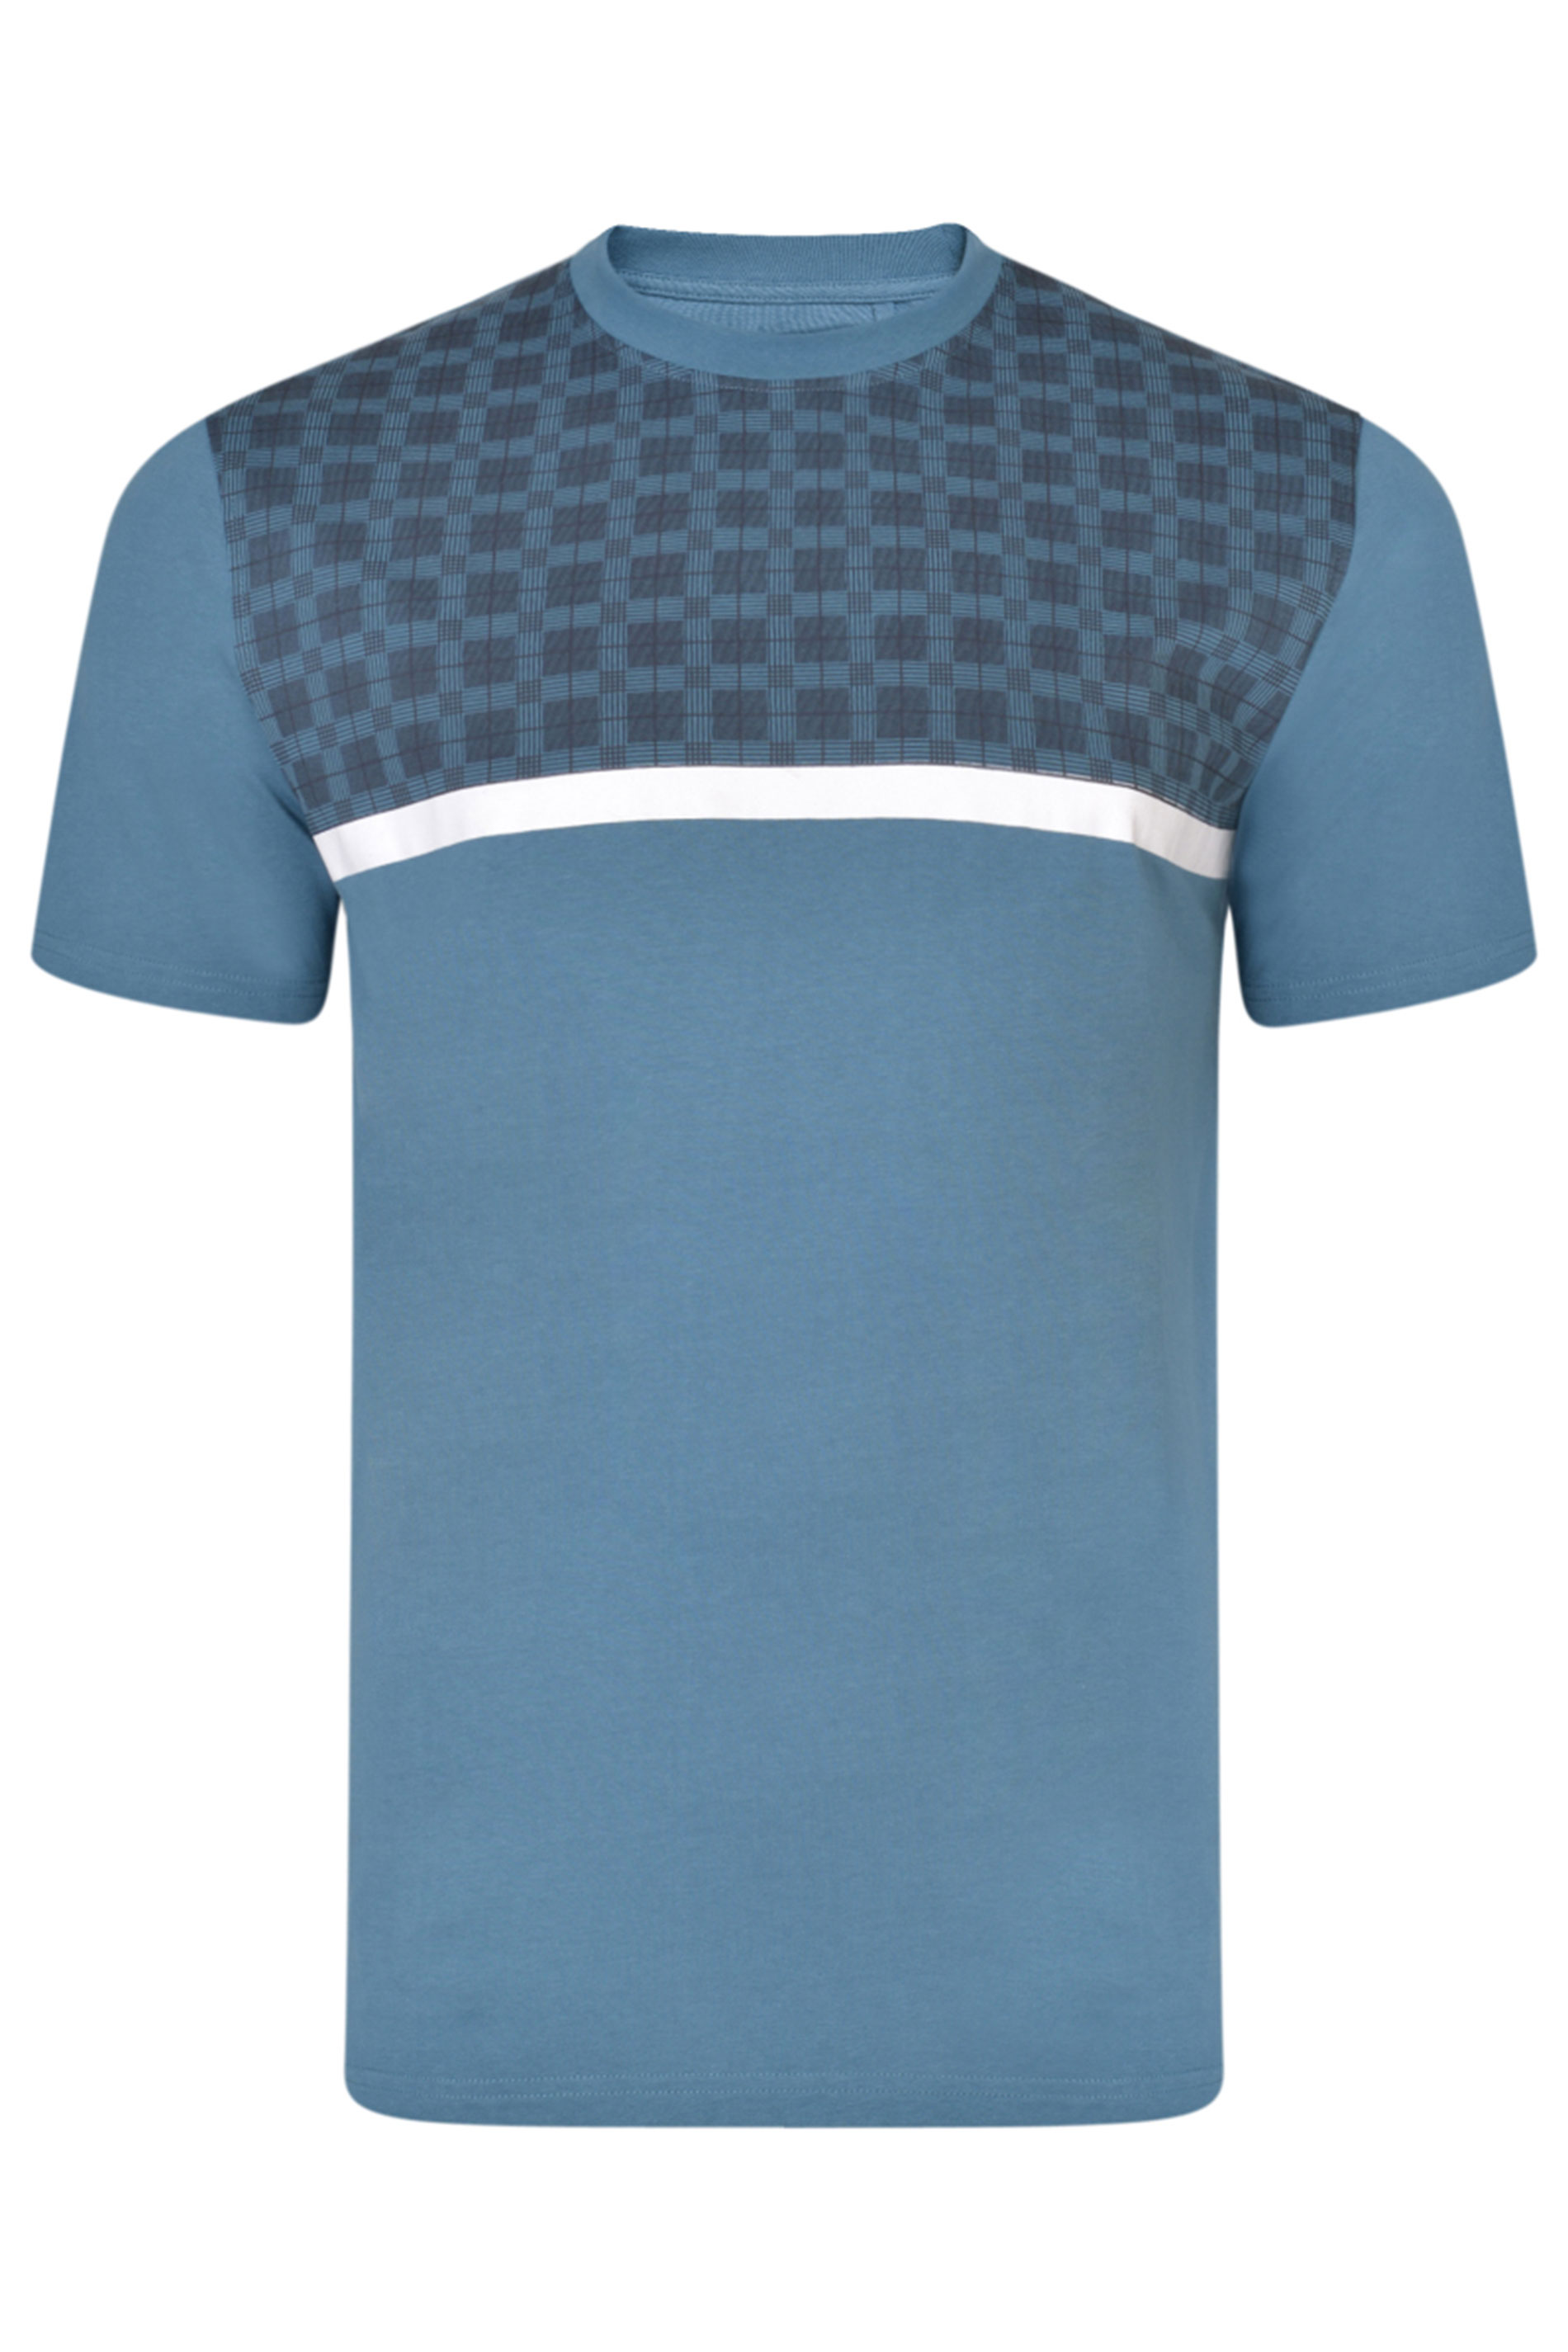 KAM Blue Check Colour Block T-Shirt